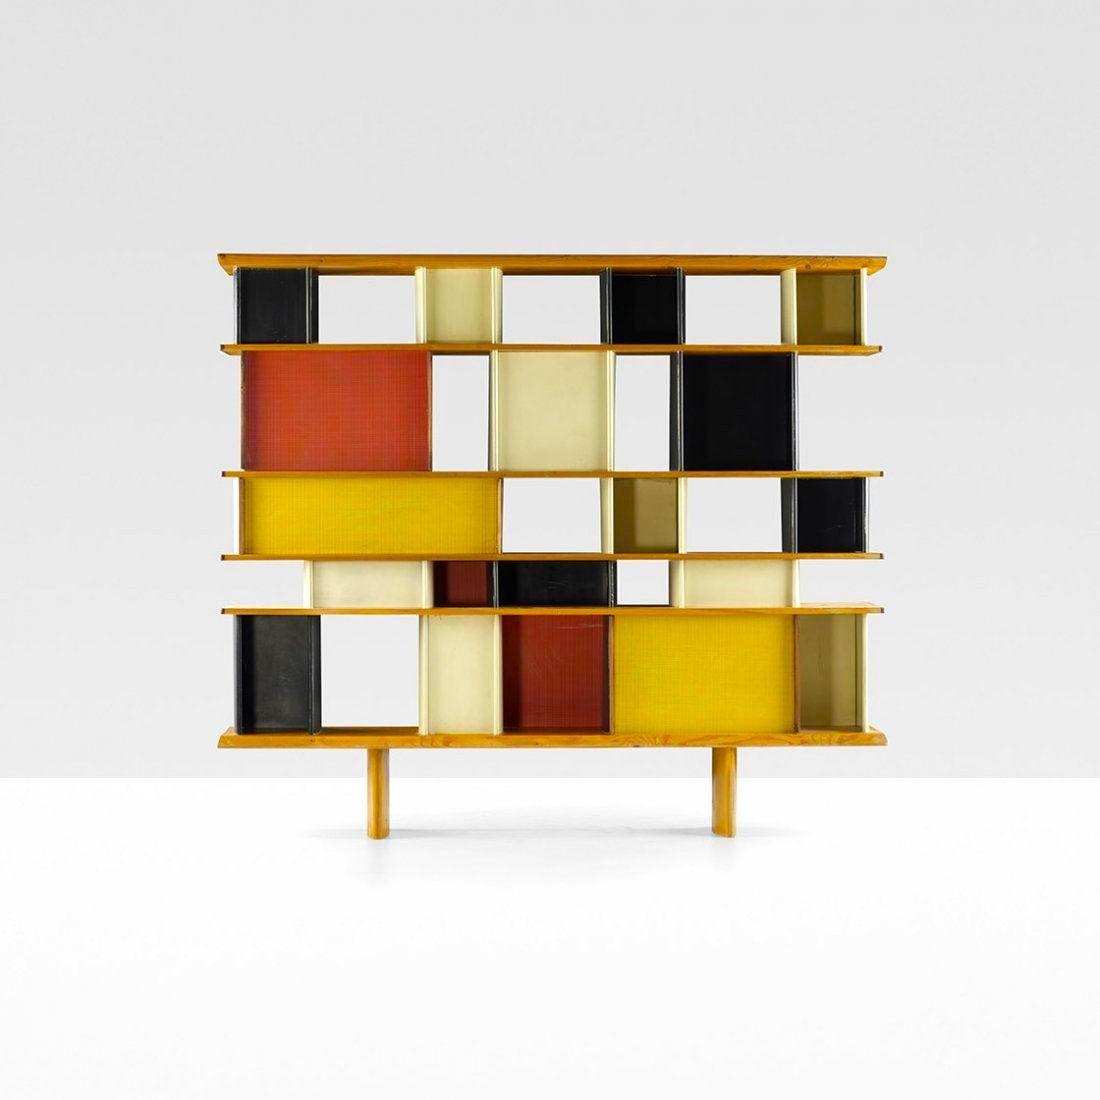 Design Luminy Bibliotheque-maison-Mexique-1952-Charlotte-Perriand-1903-1999 Aperçu rapide    Design Marseille Enseignement Luminy Master Licence DNAP+Design DNA+Design DNSEP+Design Beaux-arts